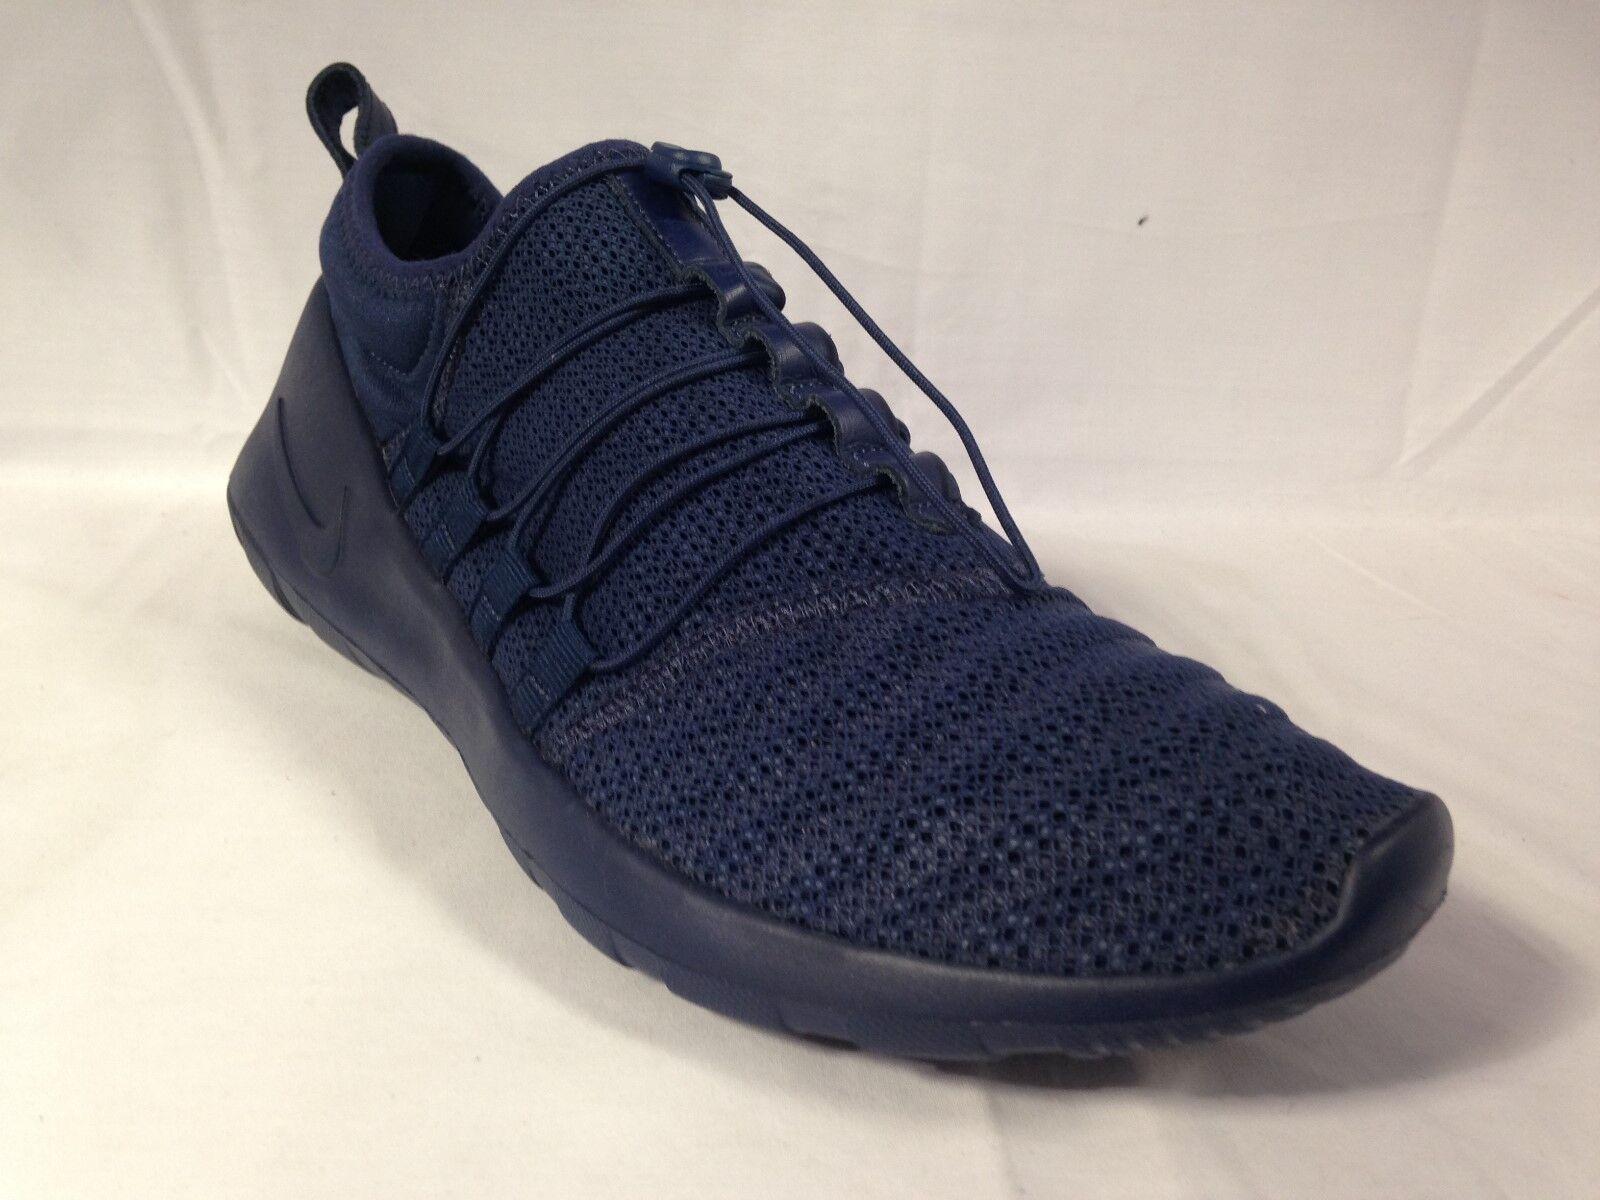 Mens Nike lab Payaa QS Blau Royal Blau 807738 400 Größe  UK 9_9.5